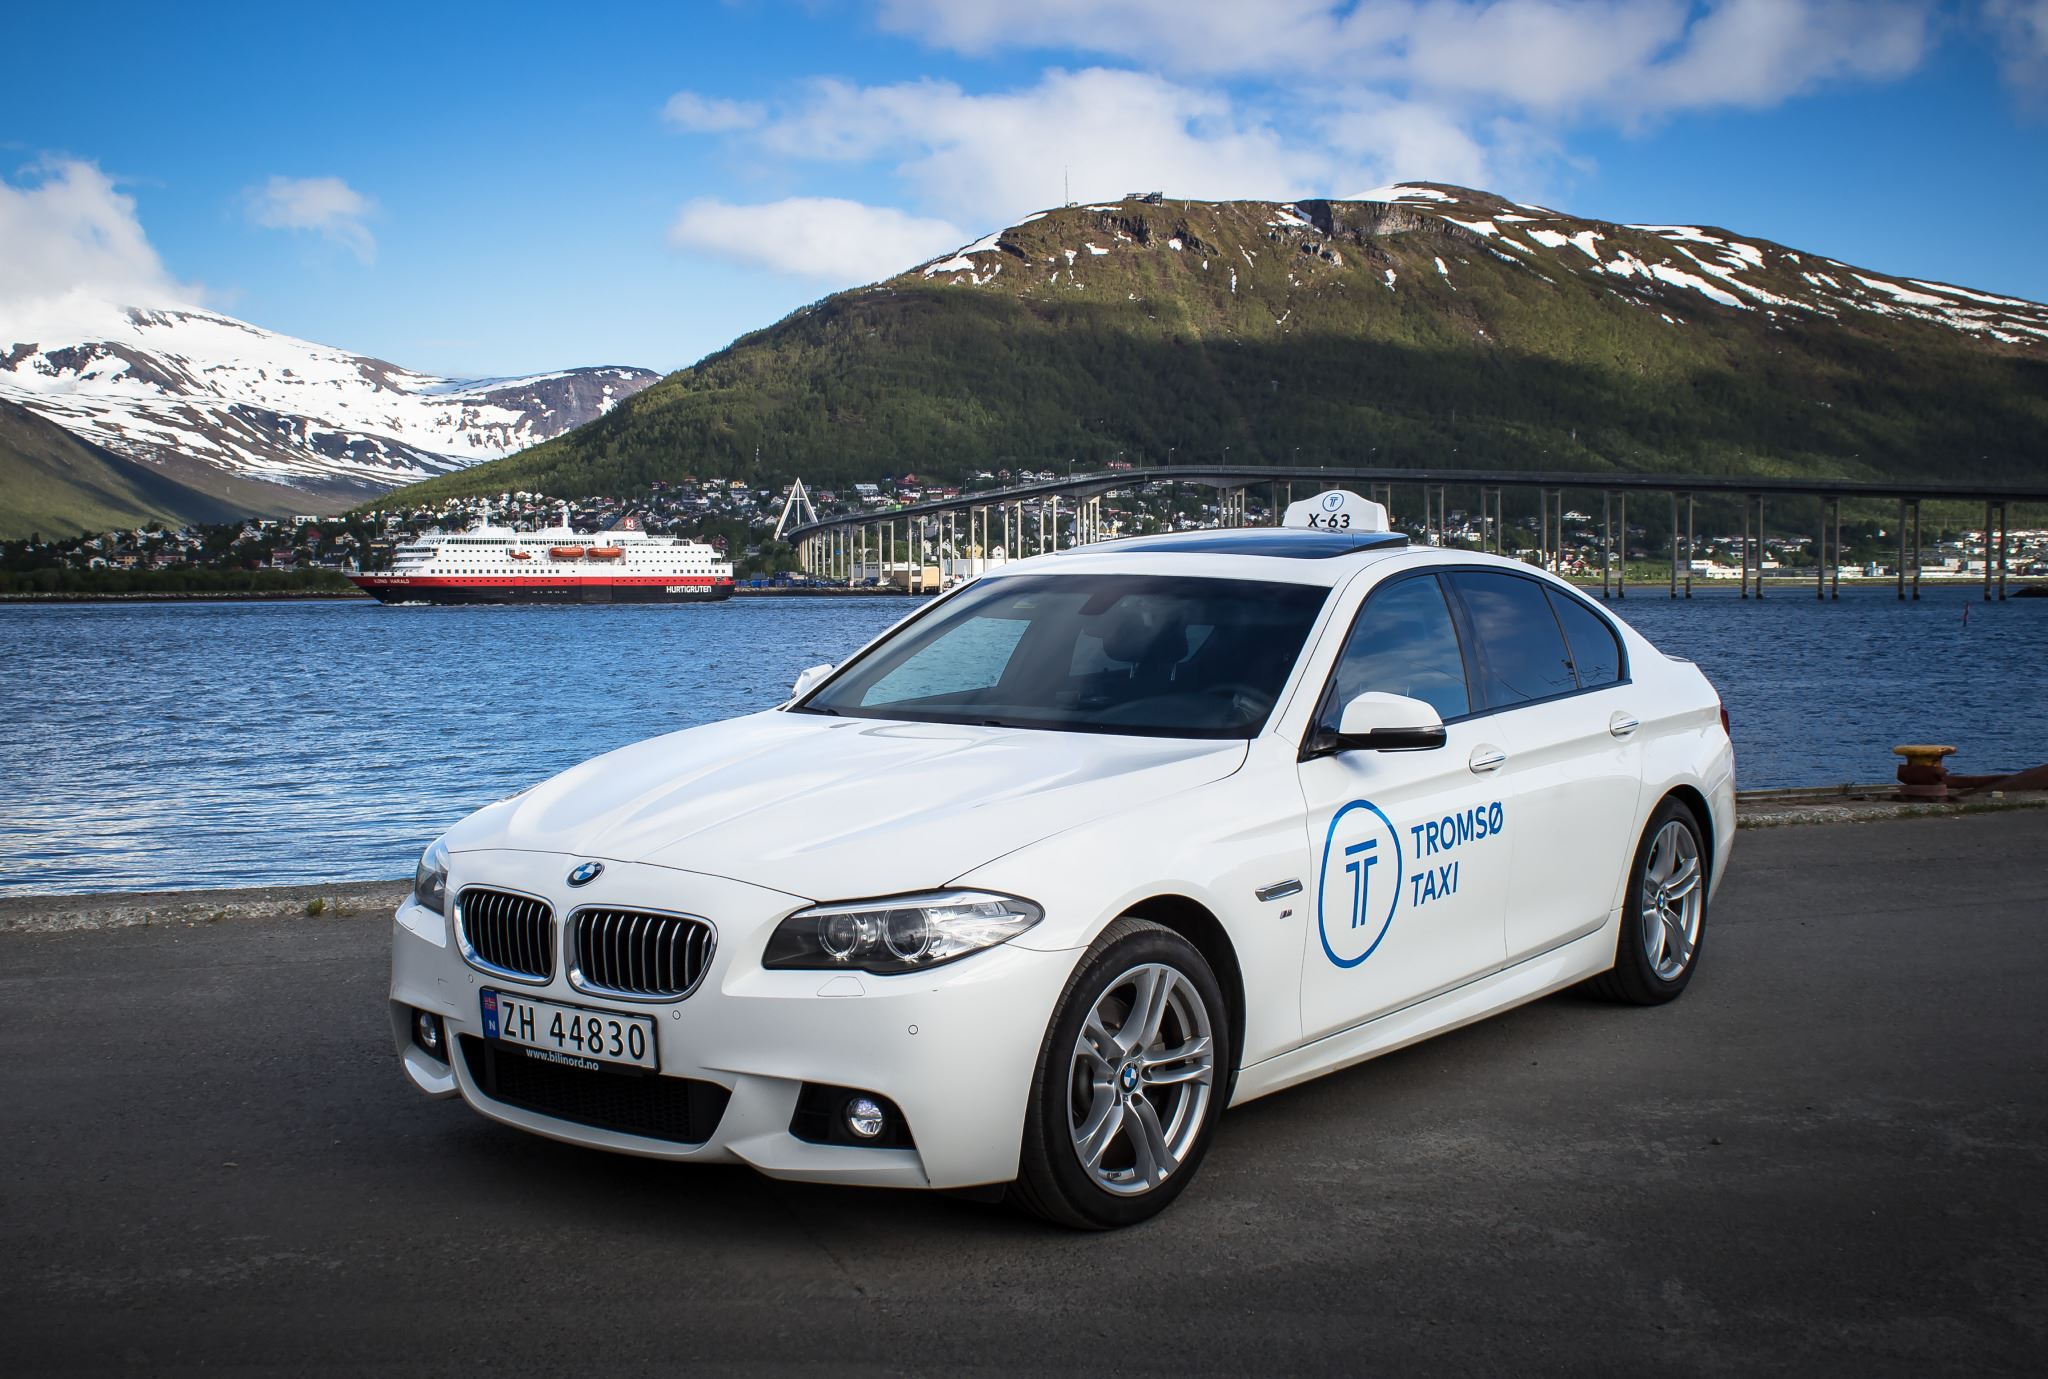 Tromsø Taxi AS